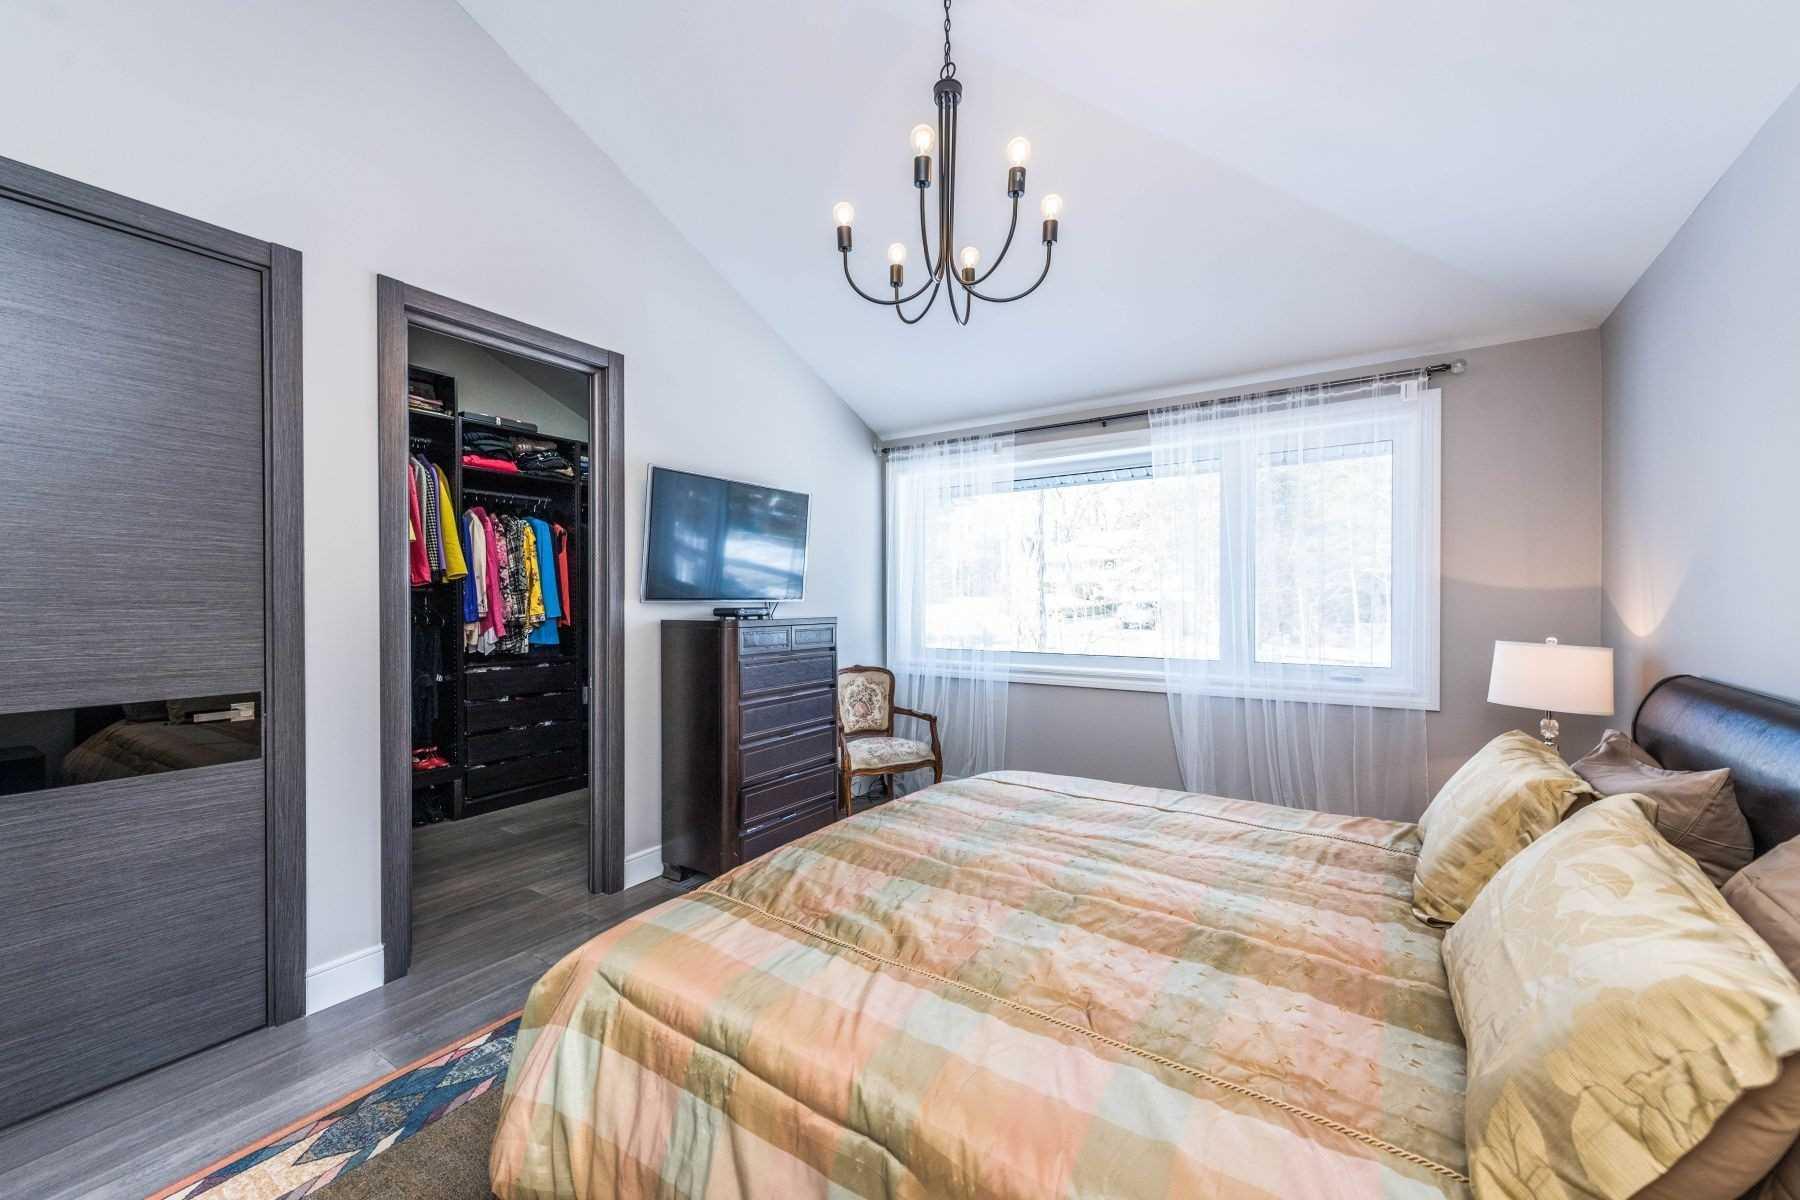 59 Leggett Ave, Toronto, Ontario M9P1X3, 3 Bedrooms Bedrooms, 6 Rooms Rooms,3 BathroomsBathrooms,Detached,For Sale,Leggett,W5121900